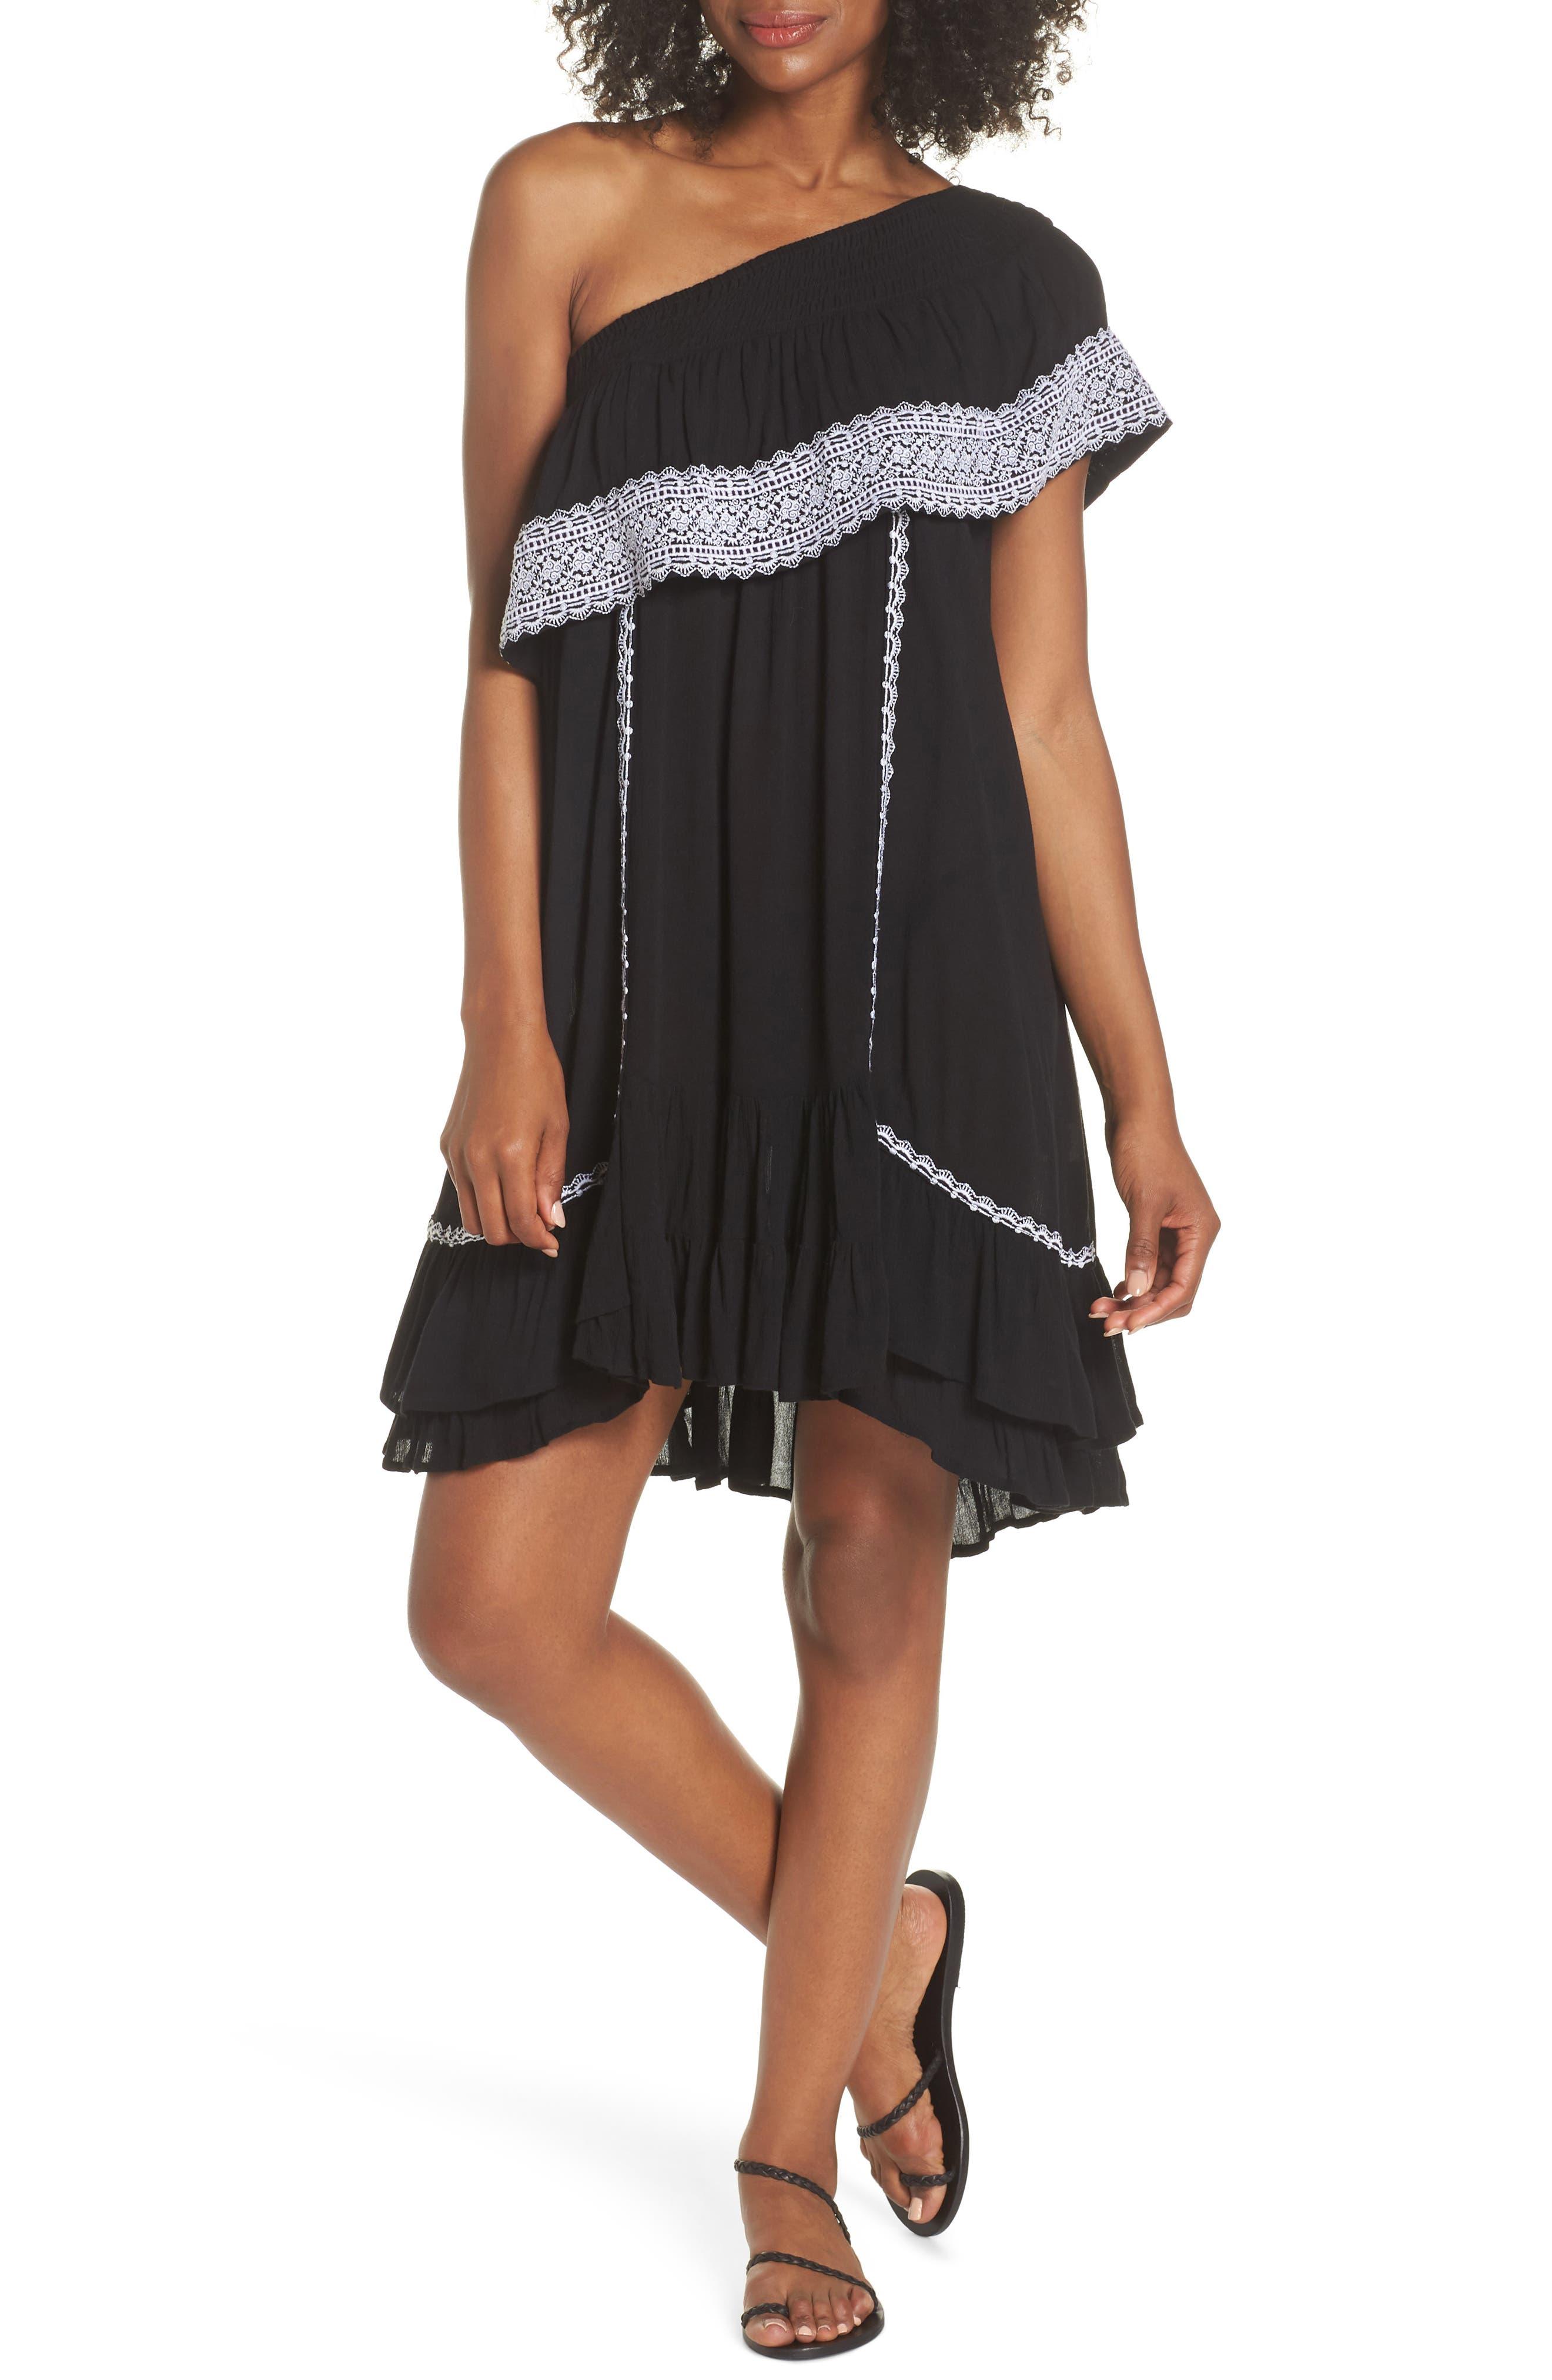 Alternate Image 1 Selected - Muche et Muchette Gavin One-Shoulder Cover-Up Dress